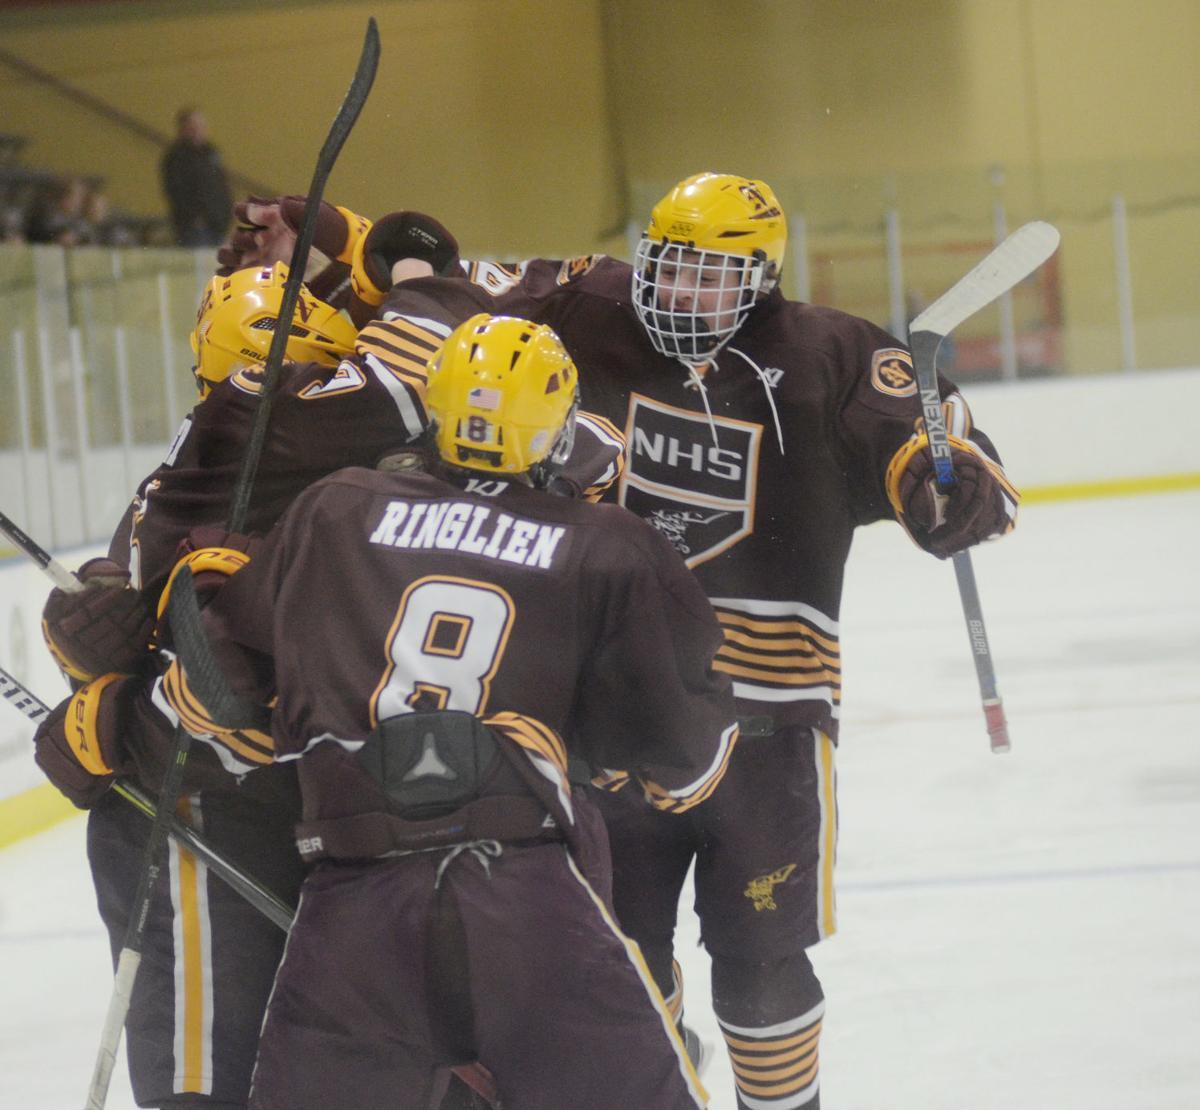 Boys hockey: Raiders crash the net, advance to Section 4A semis